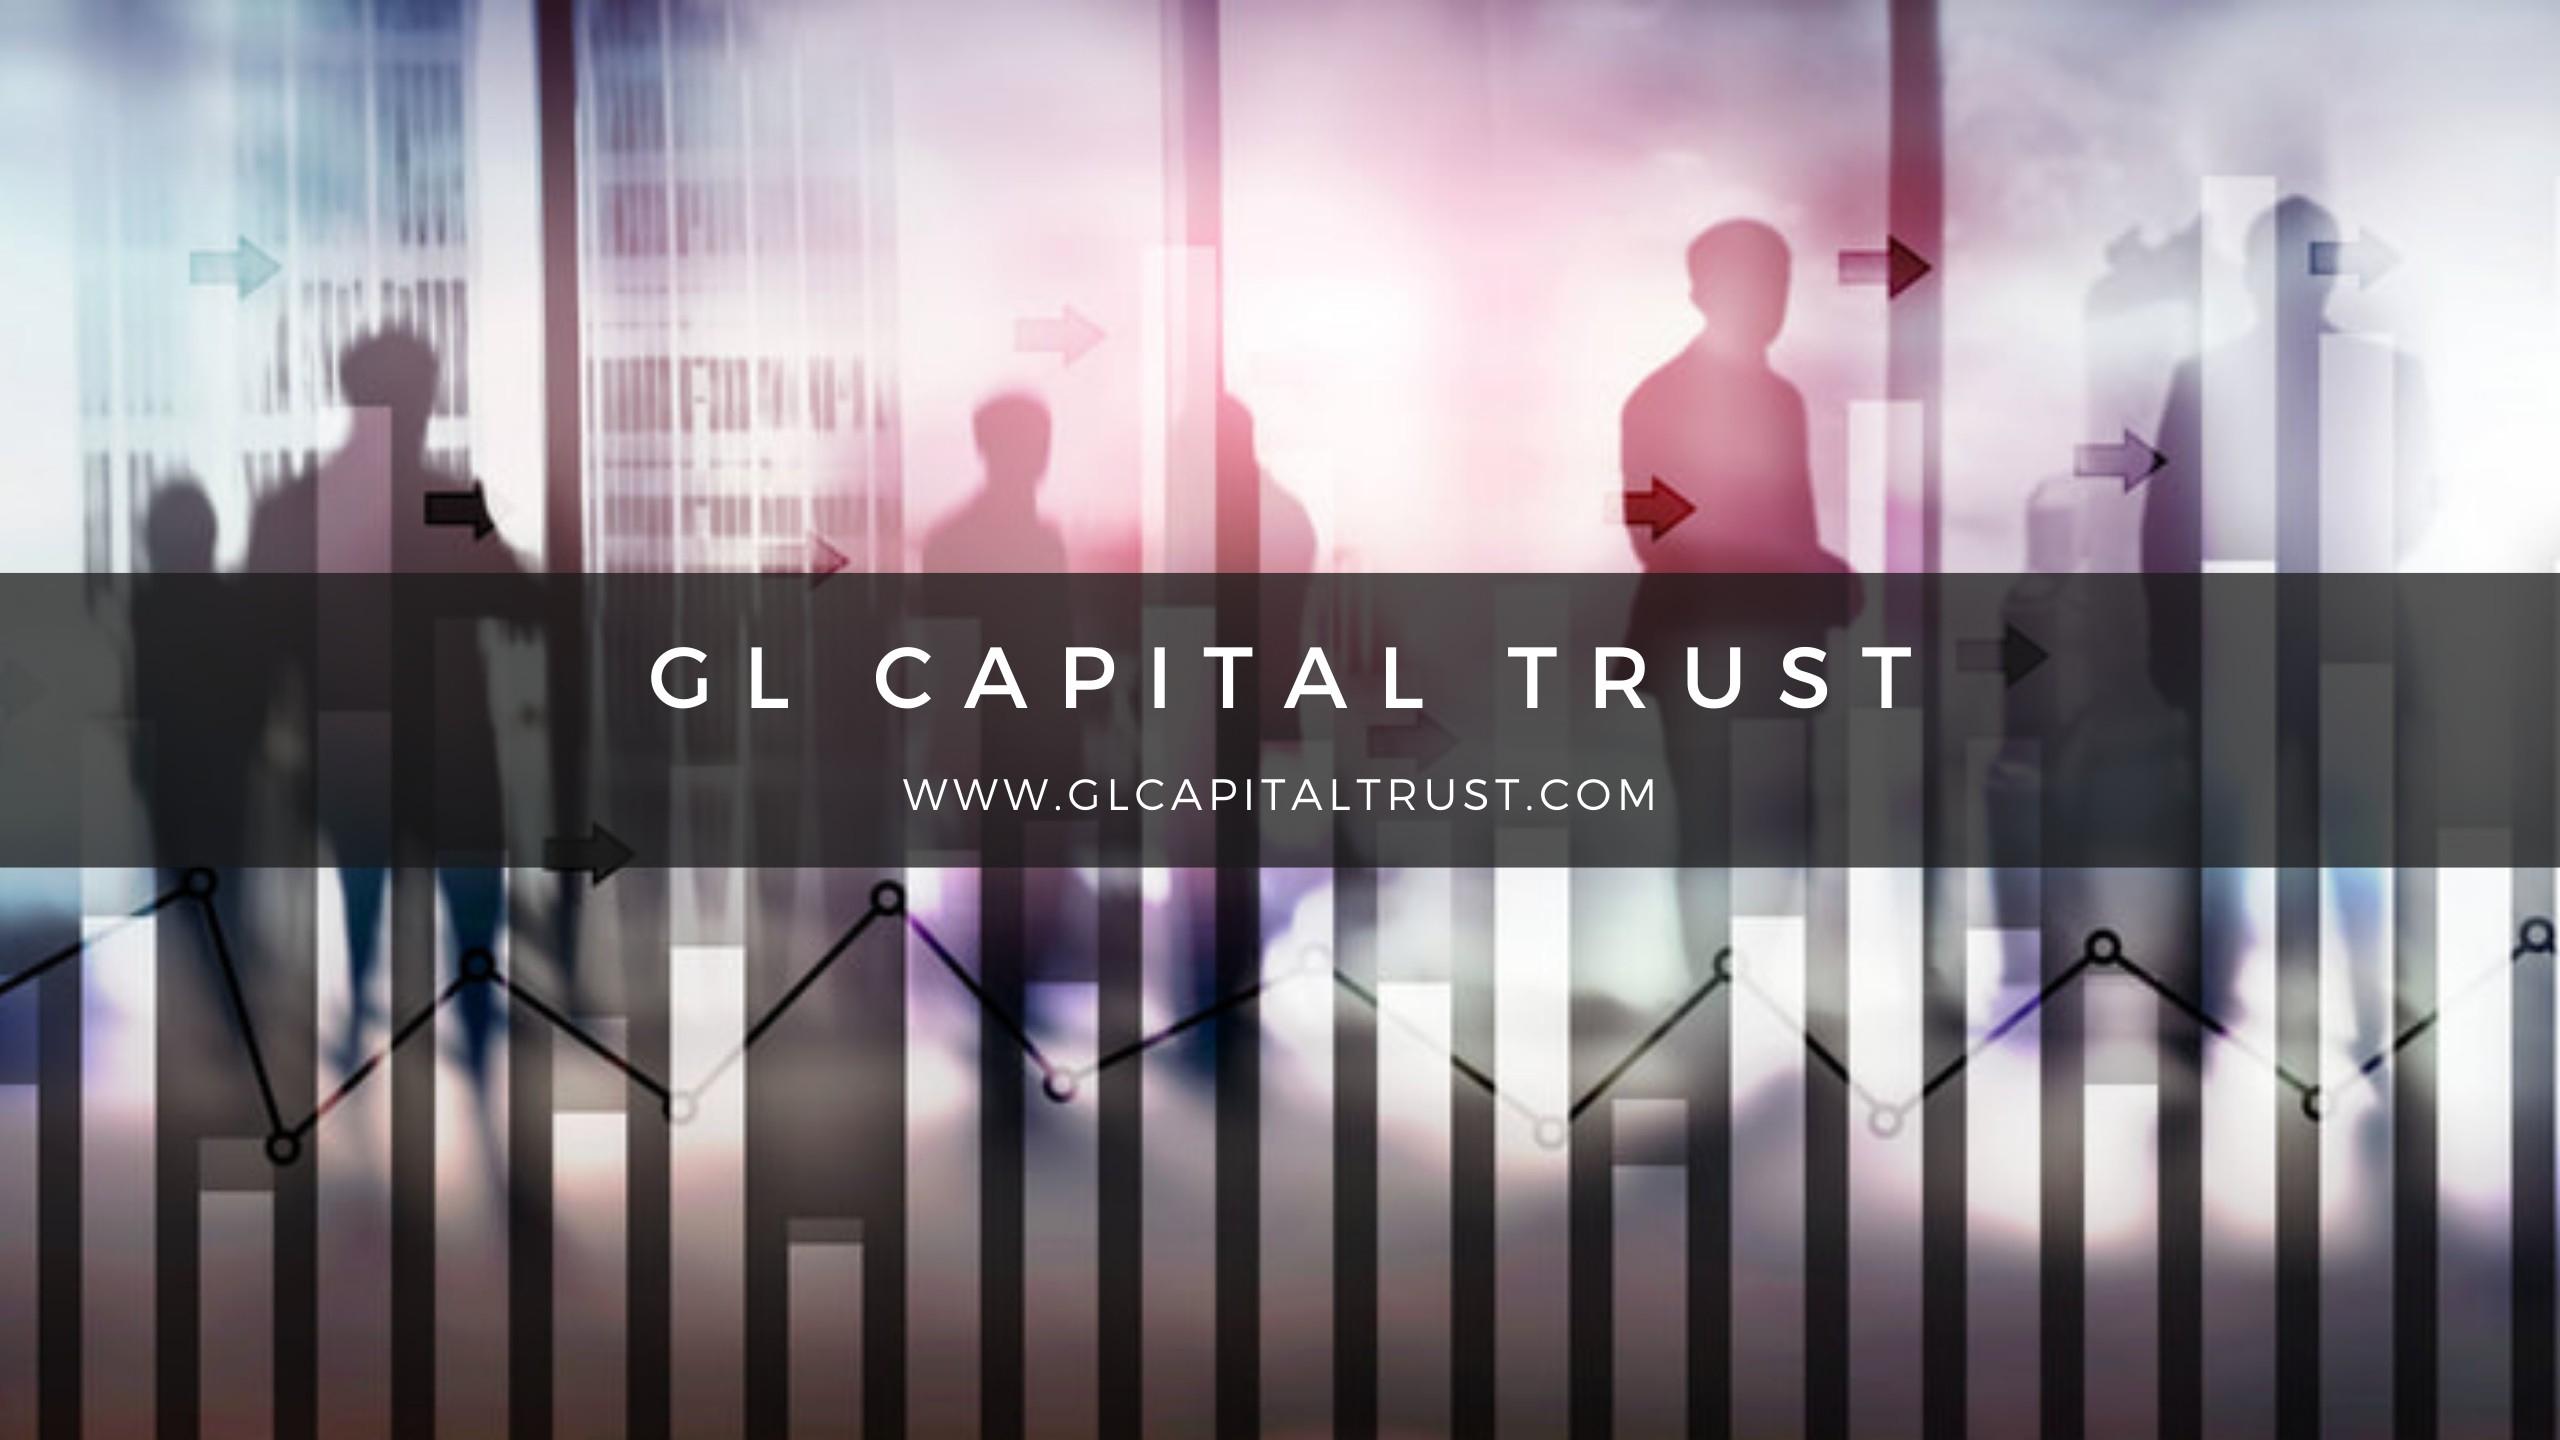 GL Capital Trust (@glcapitaltrust) Cover Image